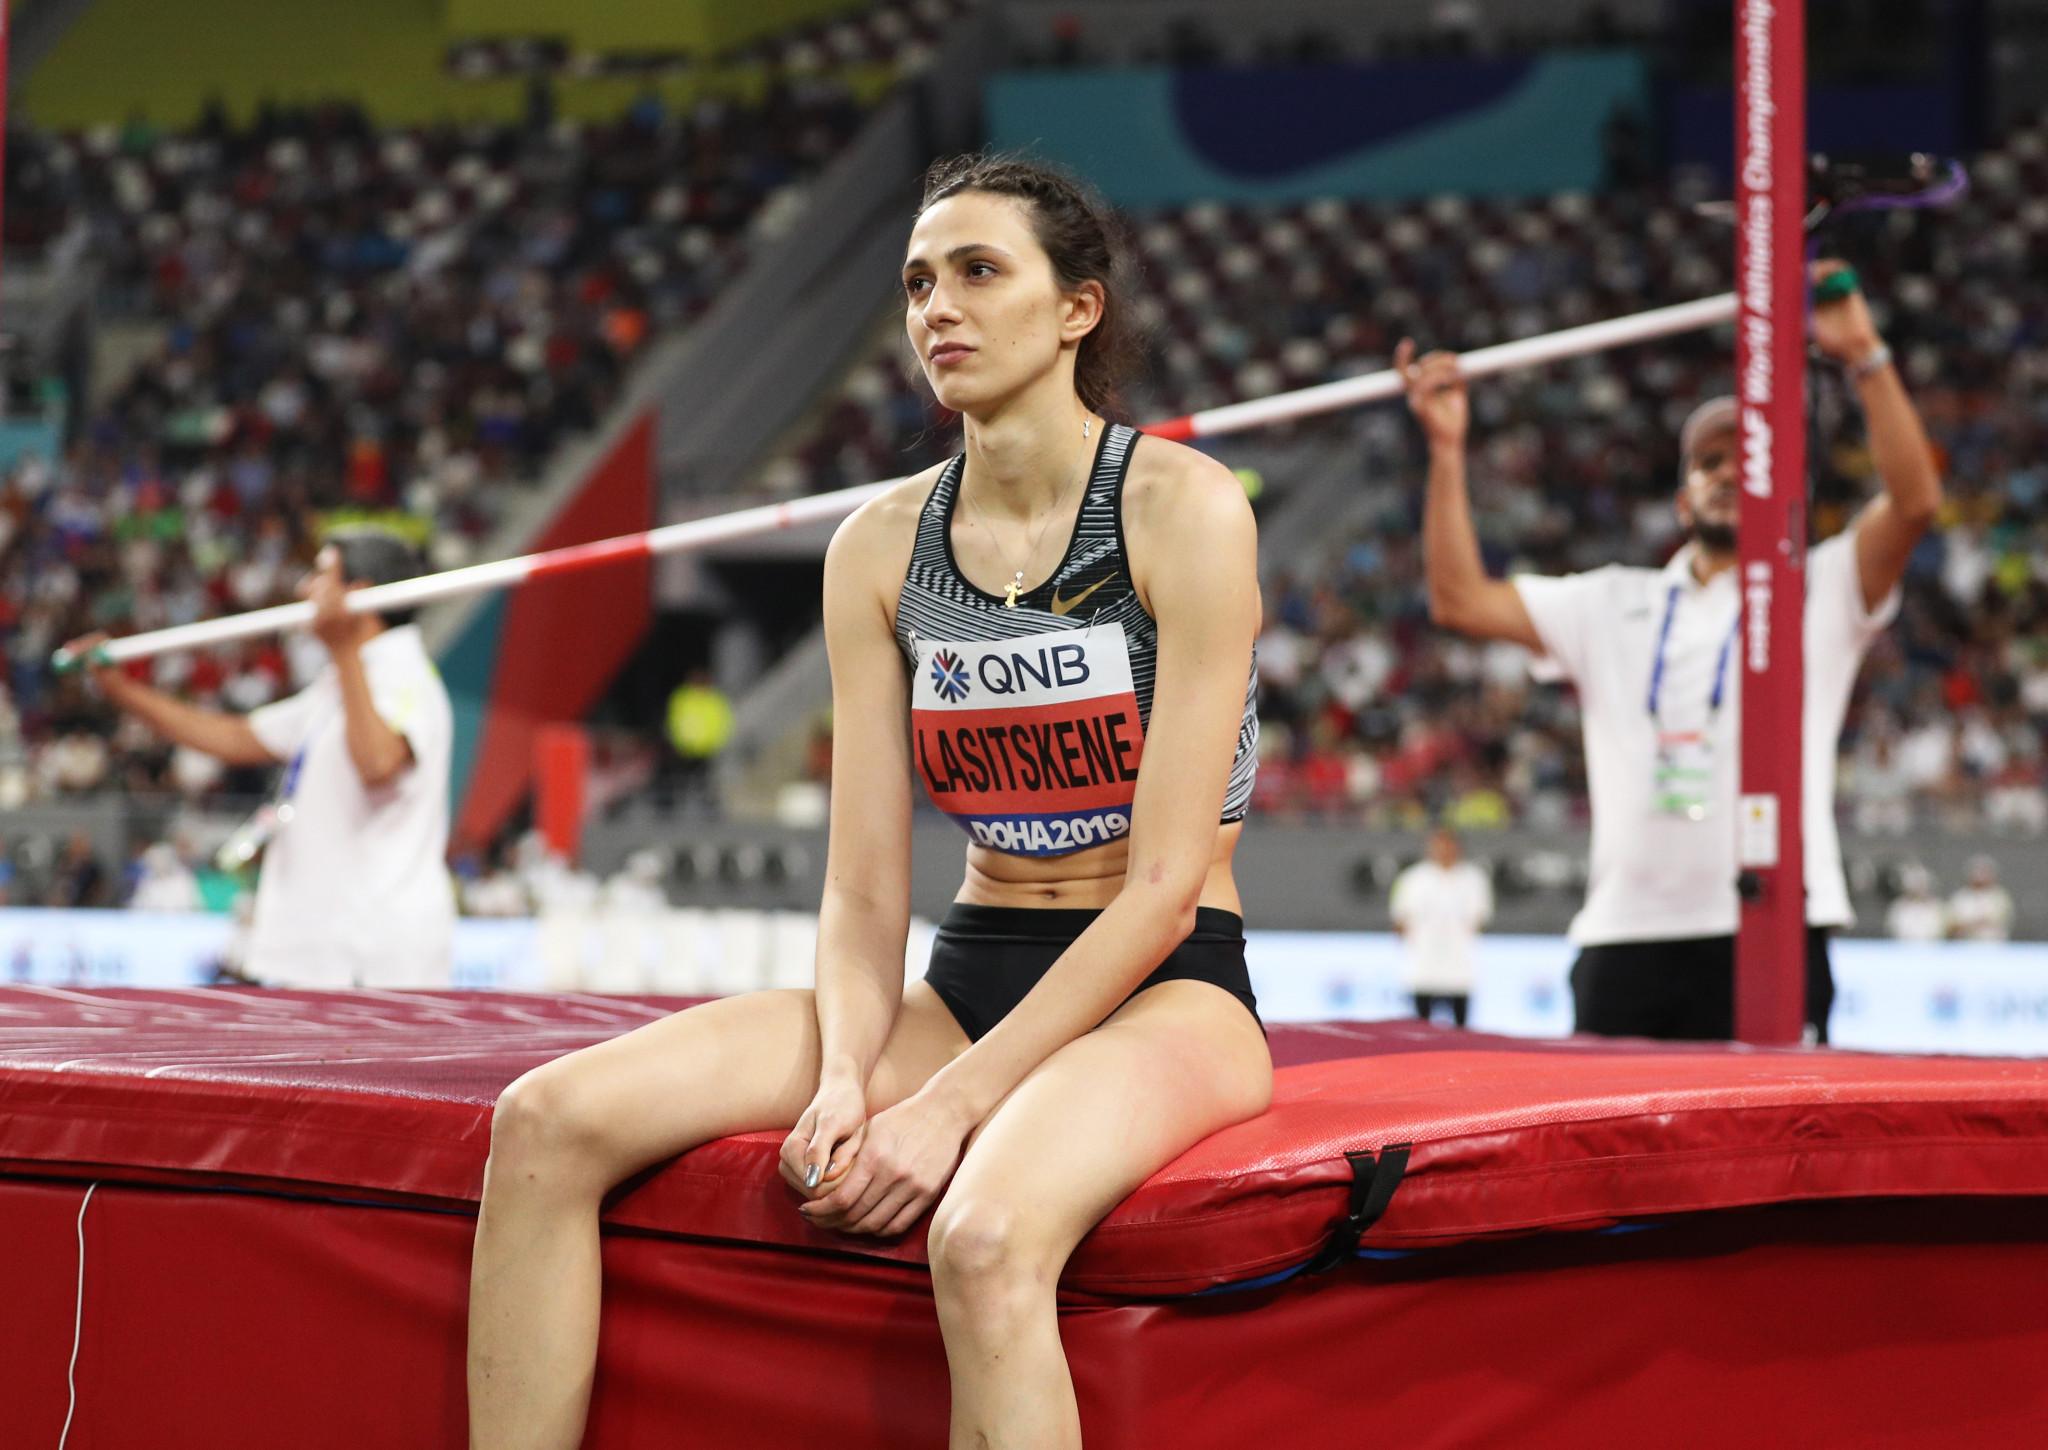 Russia's three-time world high jump champion Mariya Lasitskene accused RusAF of